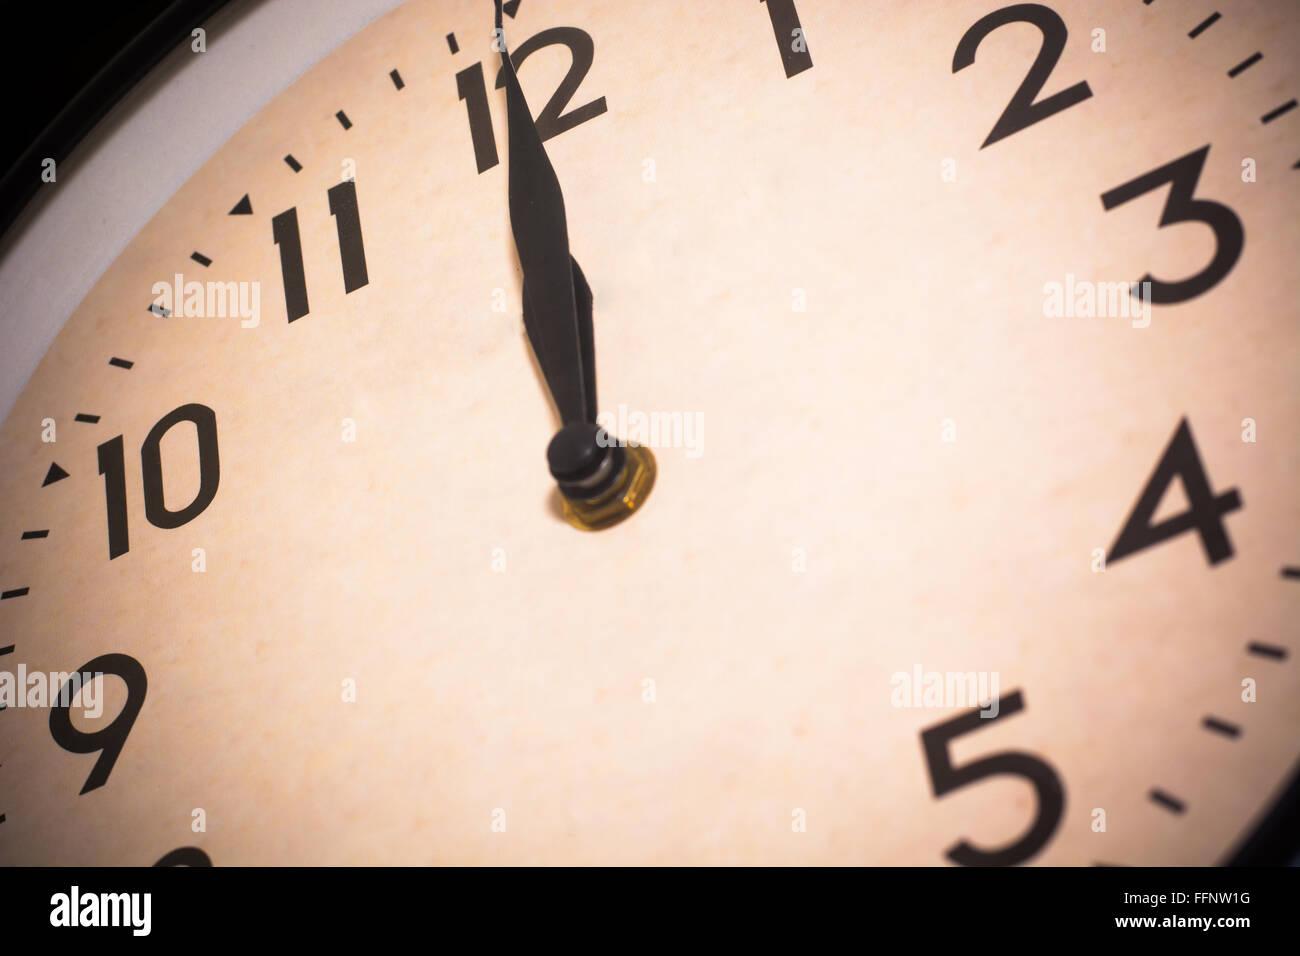 a clock on twelve oclock or midnight - Stock Image